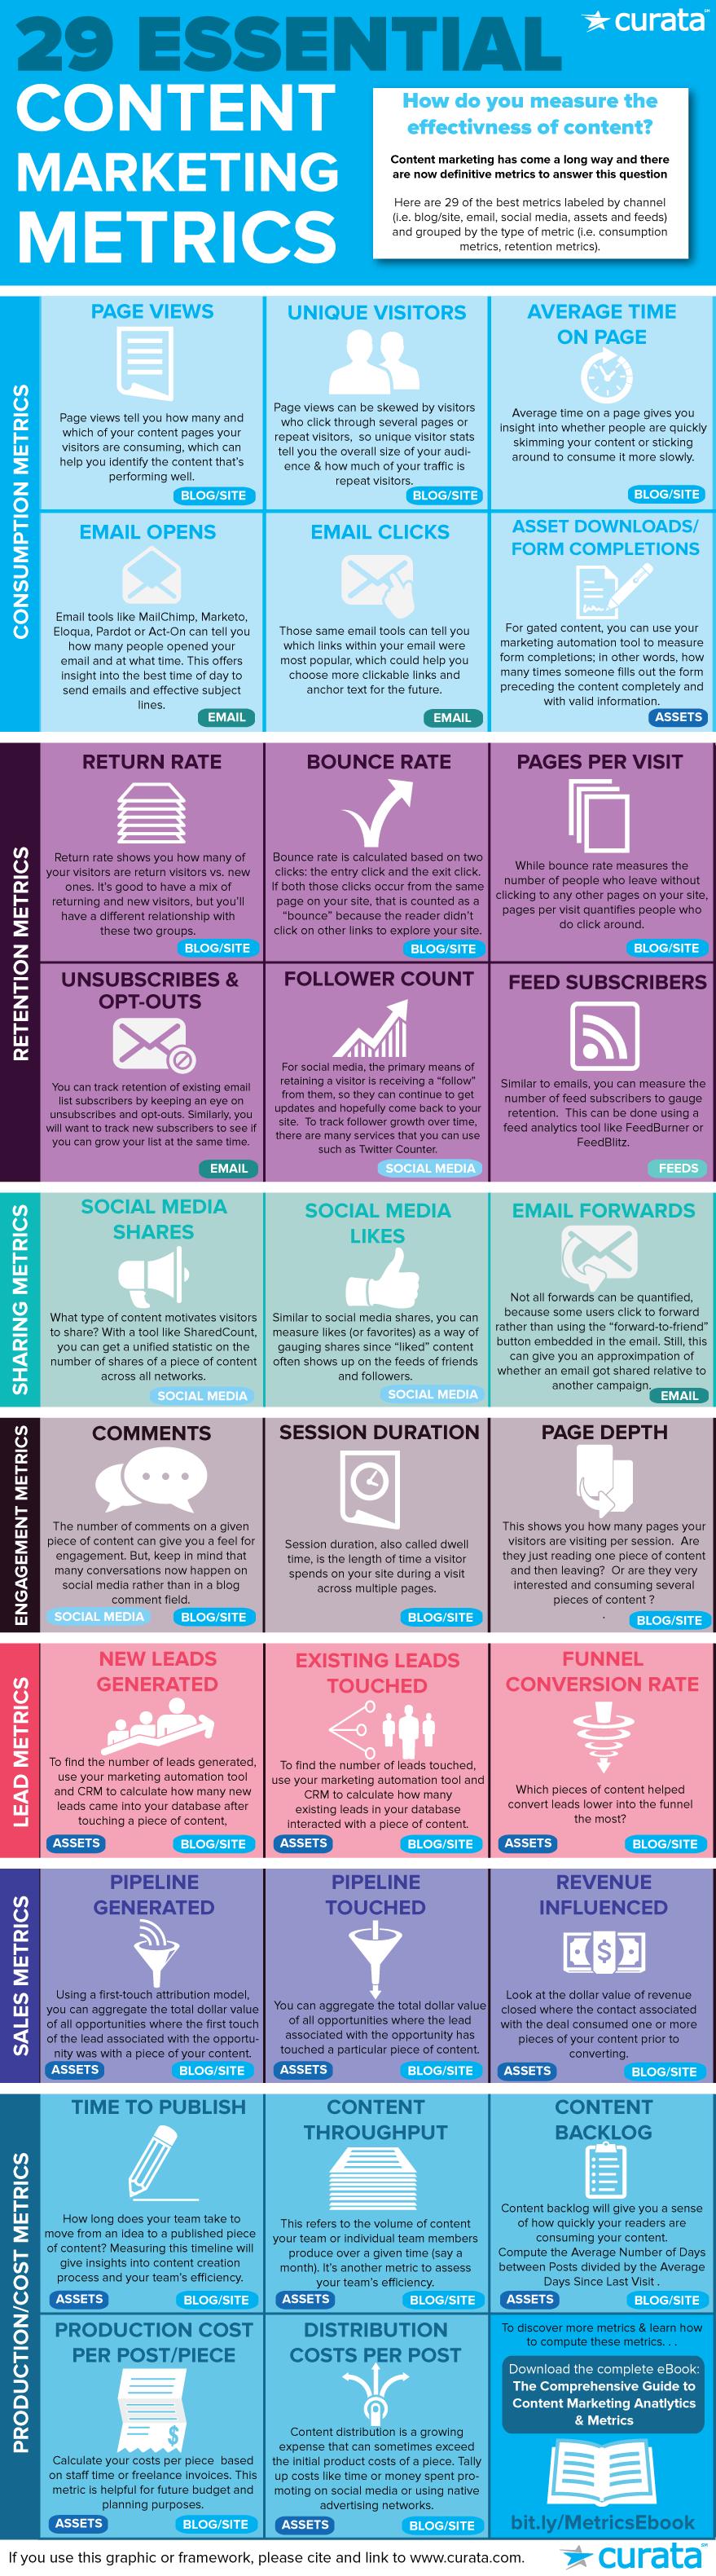 http://www.curata.com/blog/content-marketing-measurement-29-essential-metrics-infographic/